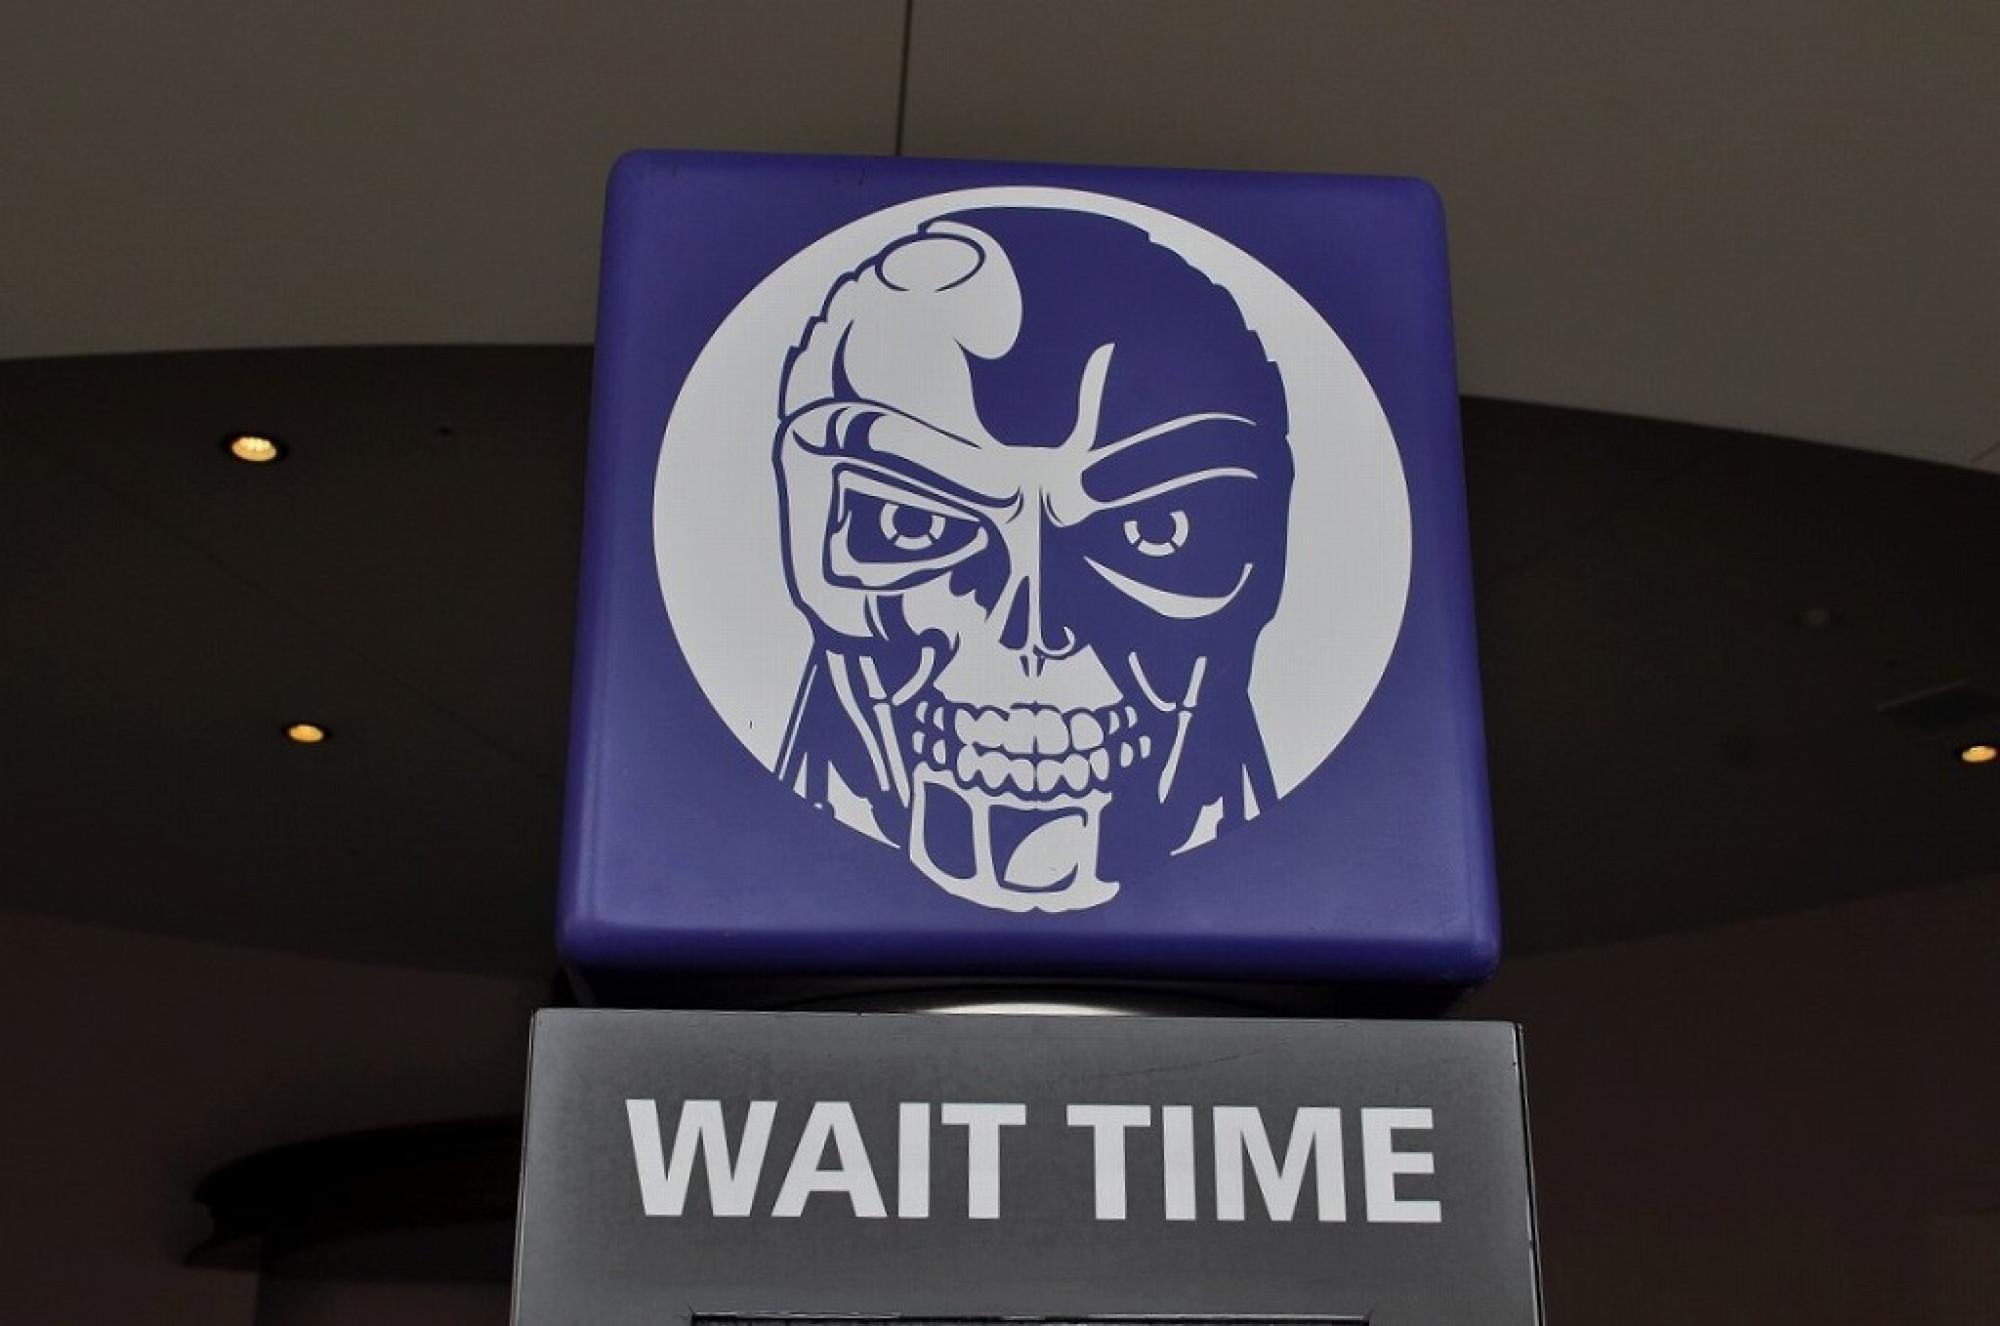 USJの「ターミネーター2:3D」入口の待ち時間表示